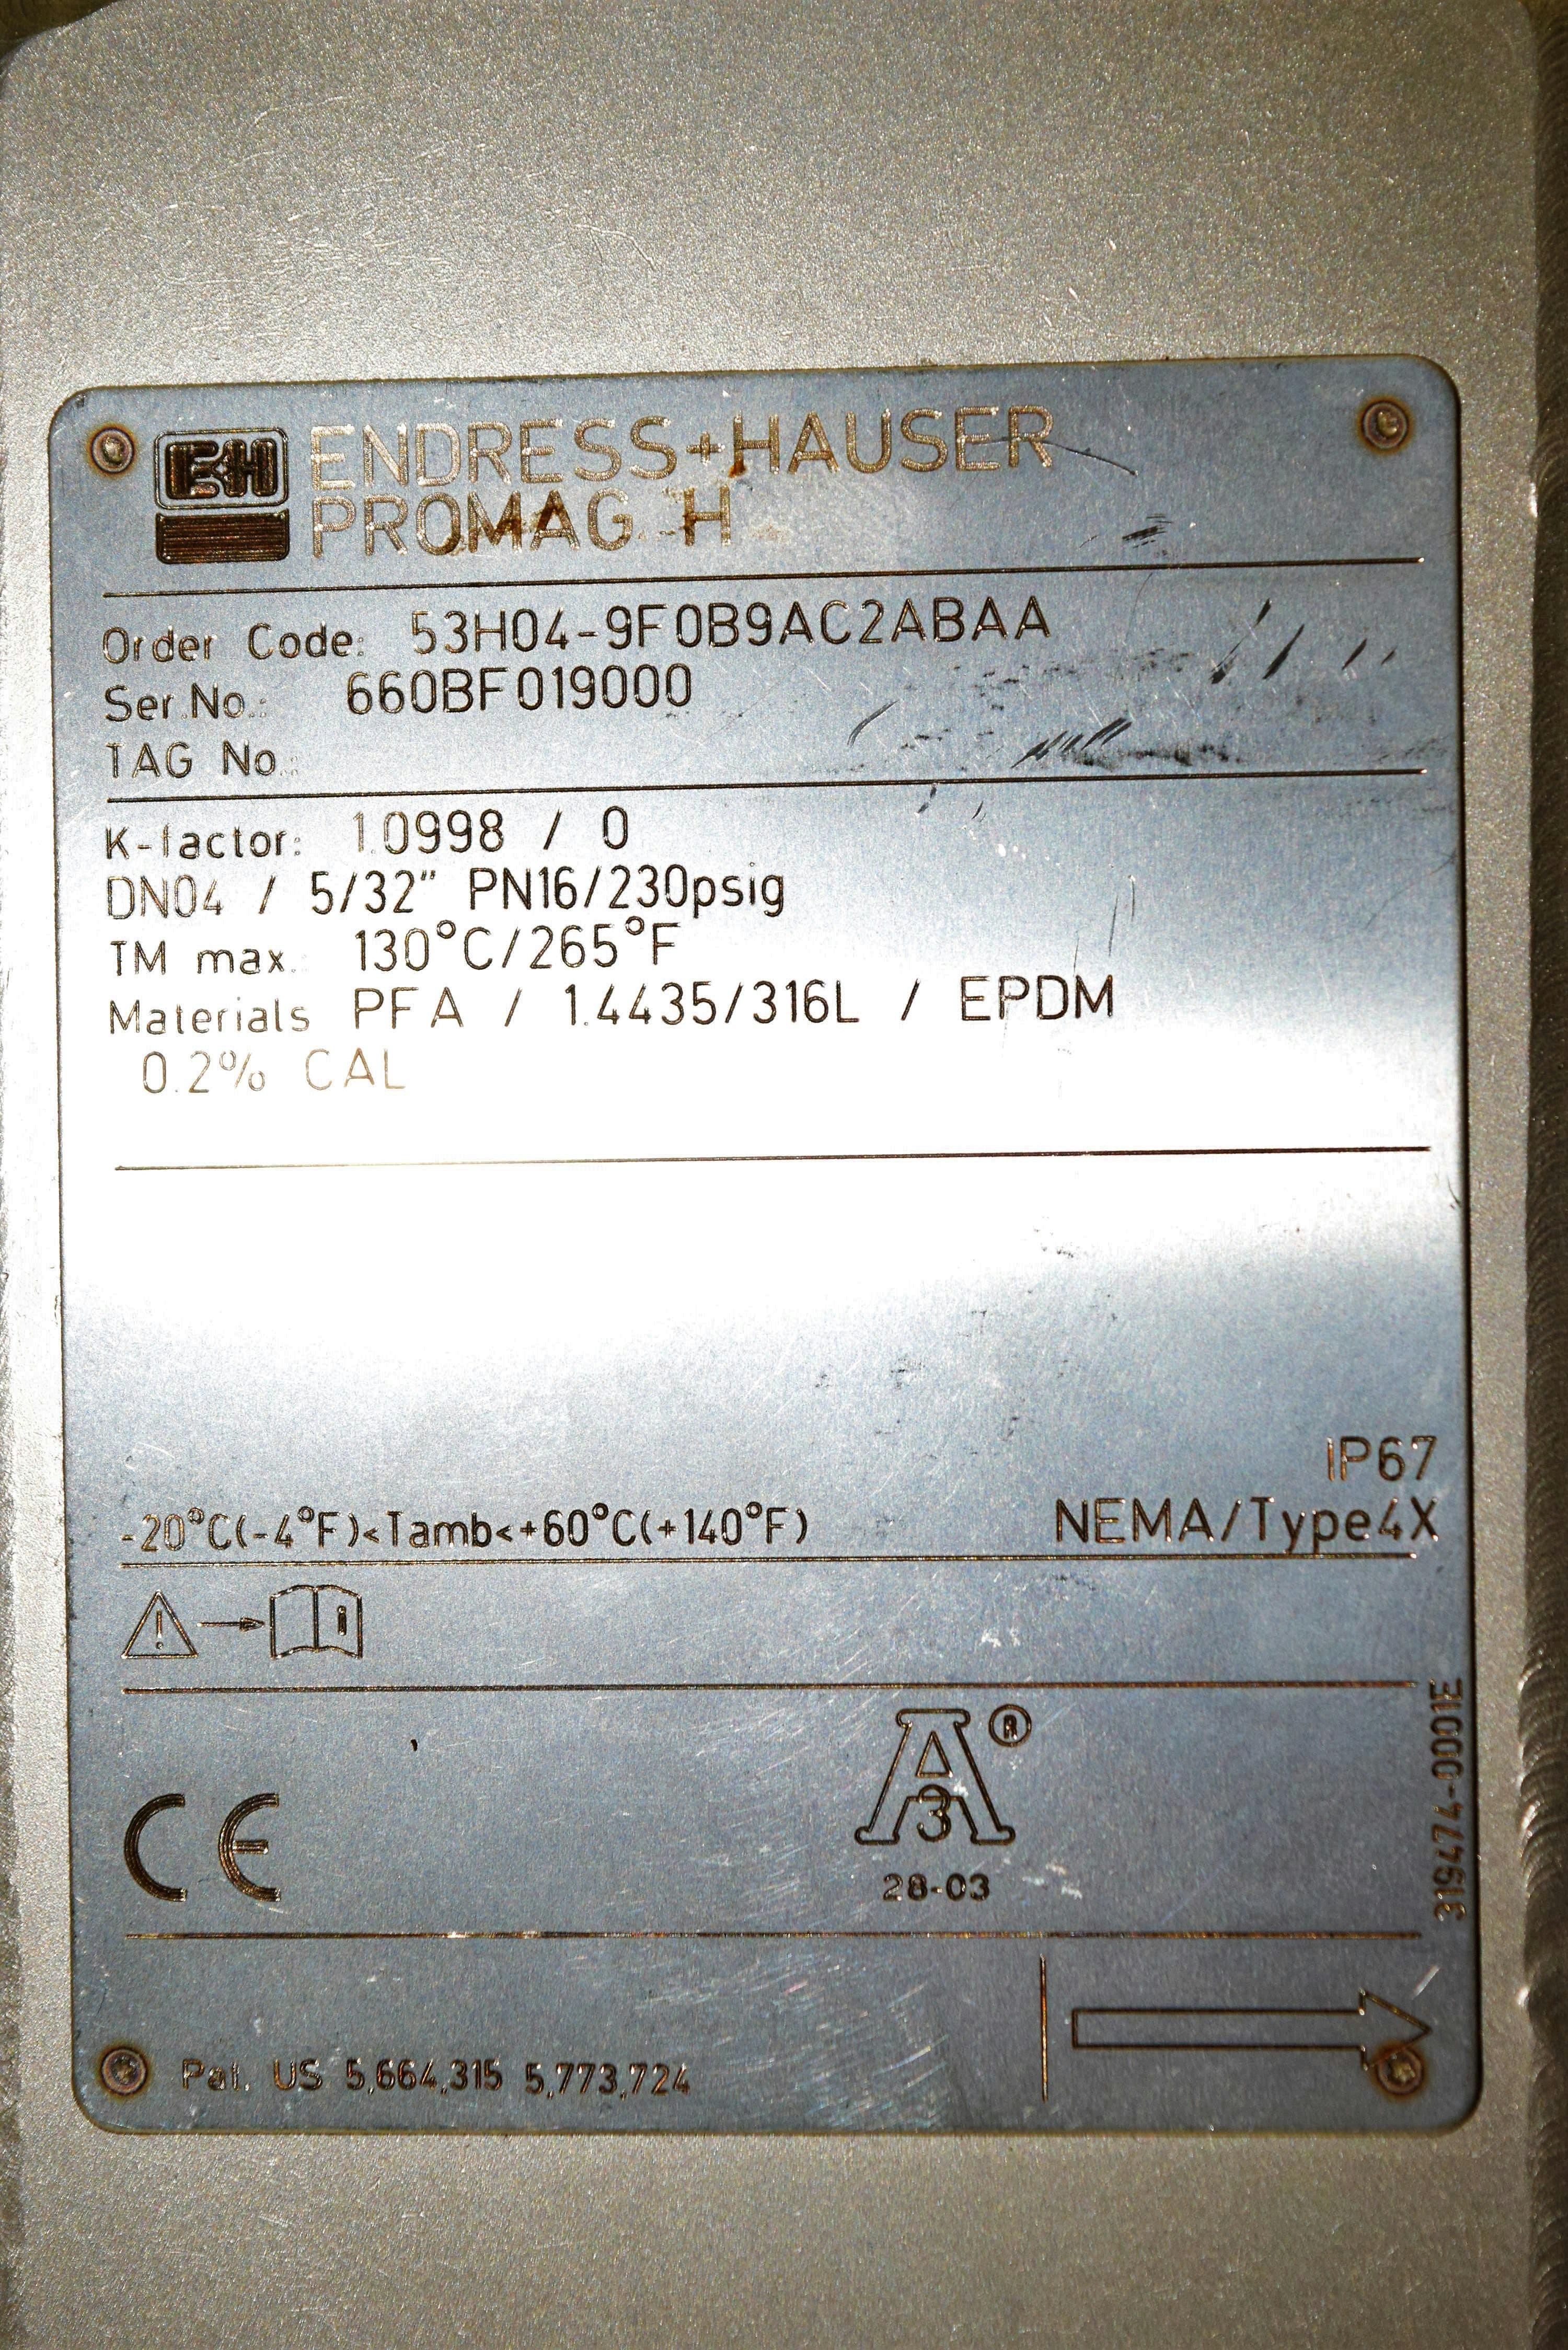 Endress Hauser Promag H Flow Meter 53H04-9F0B9AC2ABAA f/ Amersham